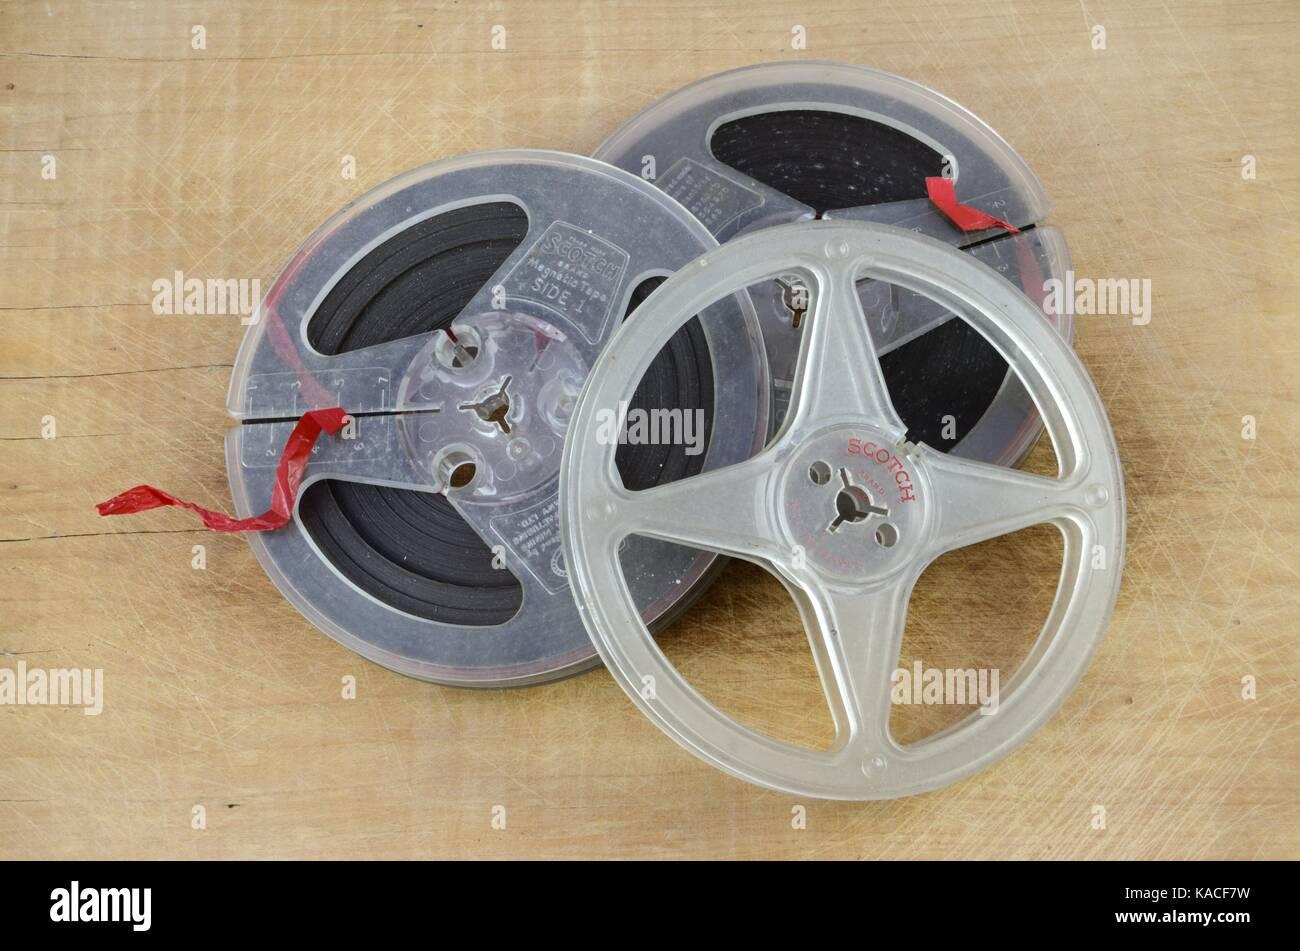 Retro reel to reel sound recording tape Stock Photo